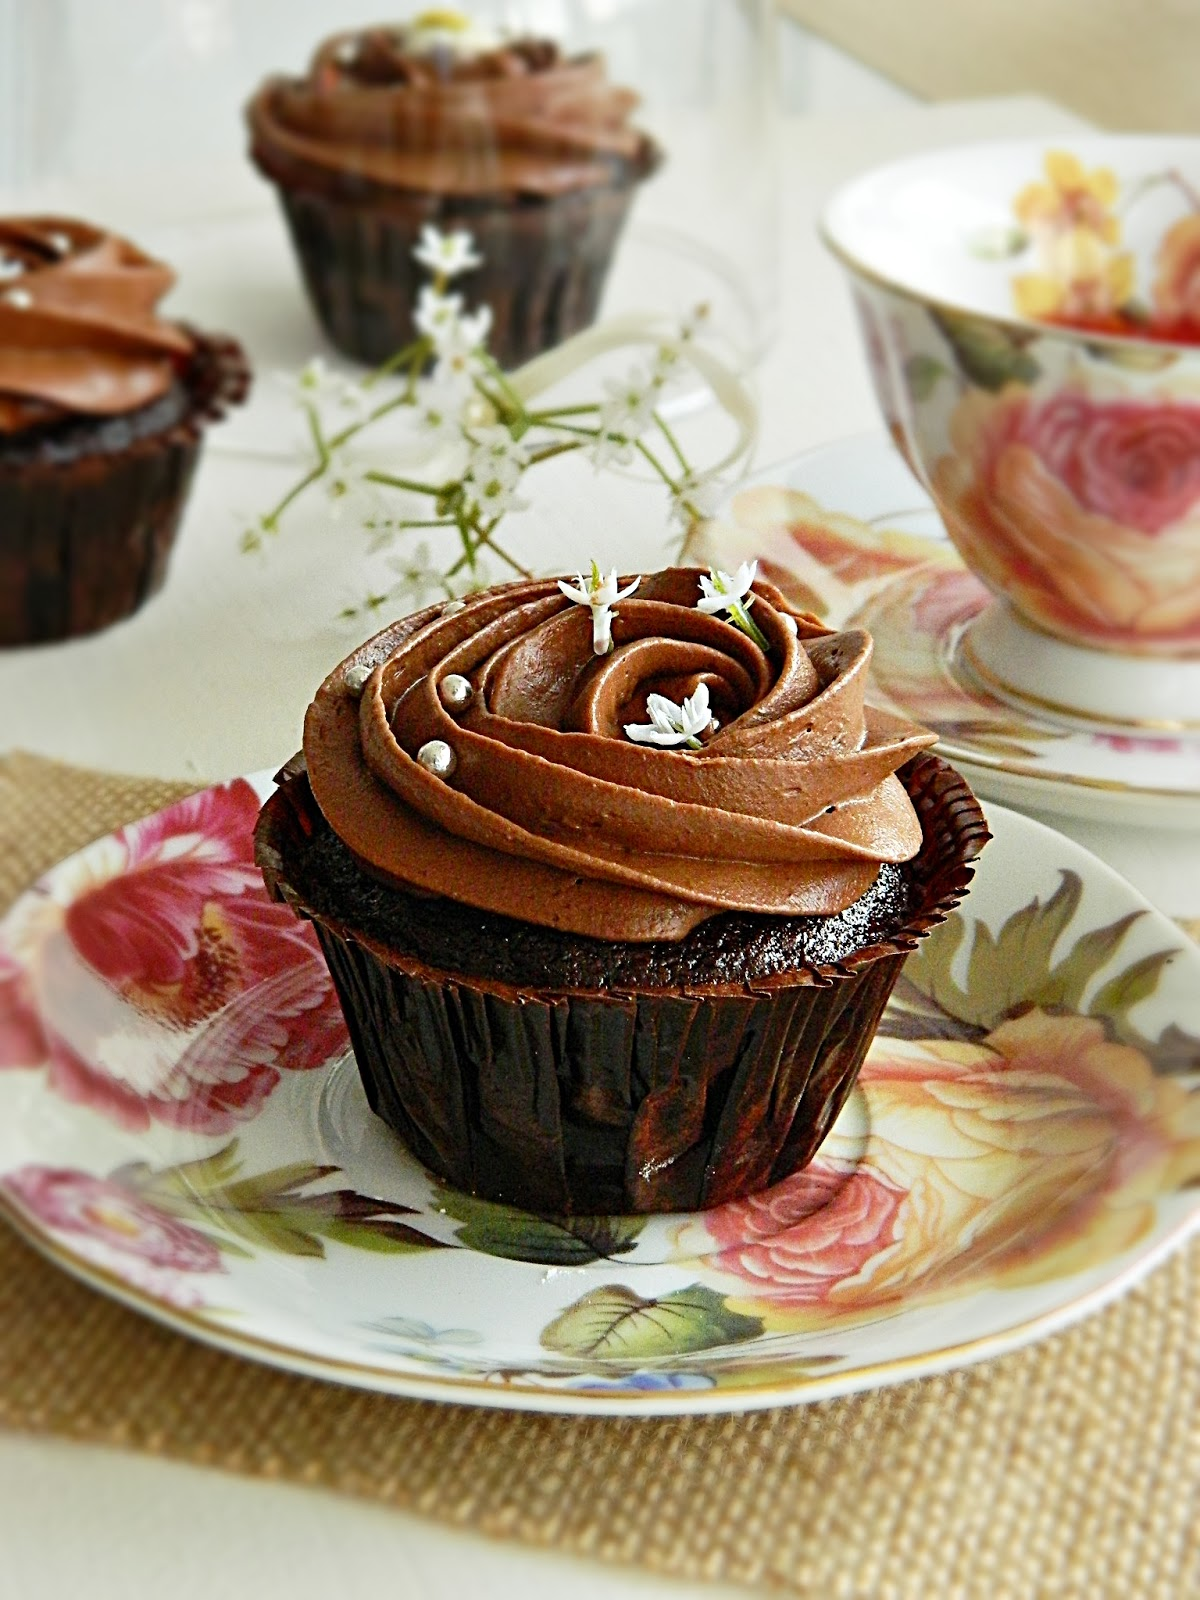 dr ola 39 s kitchen chocolate buttercream frosting schokoladen frosting f r cupcakes. Black Bedroom Furniture Sets. Home Design Ideas